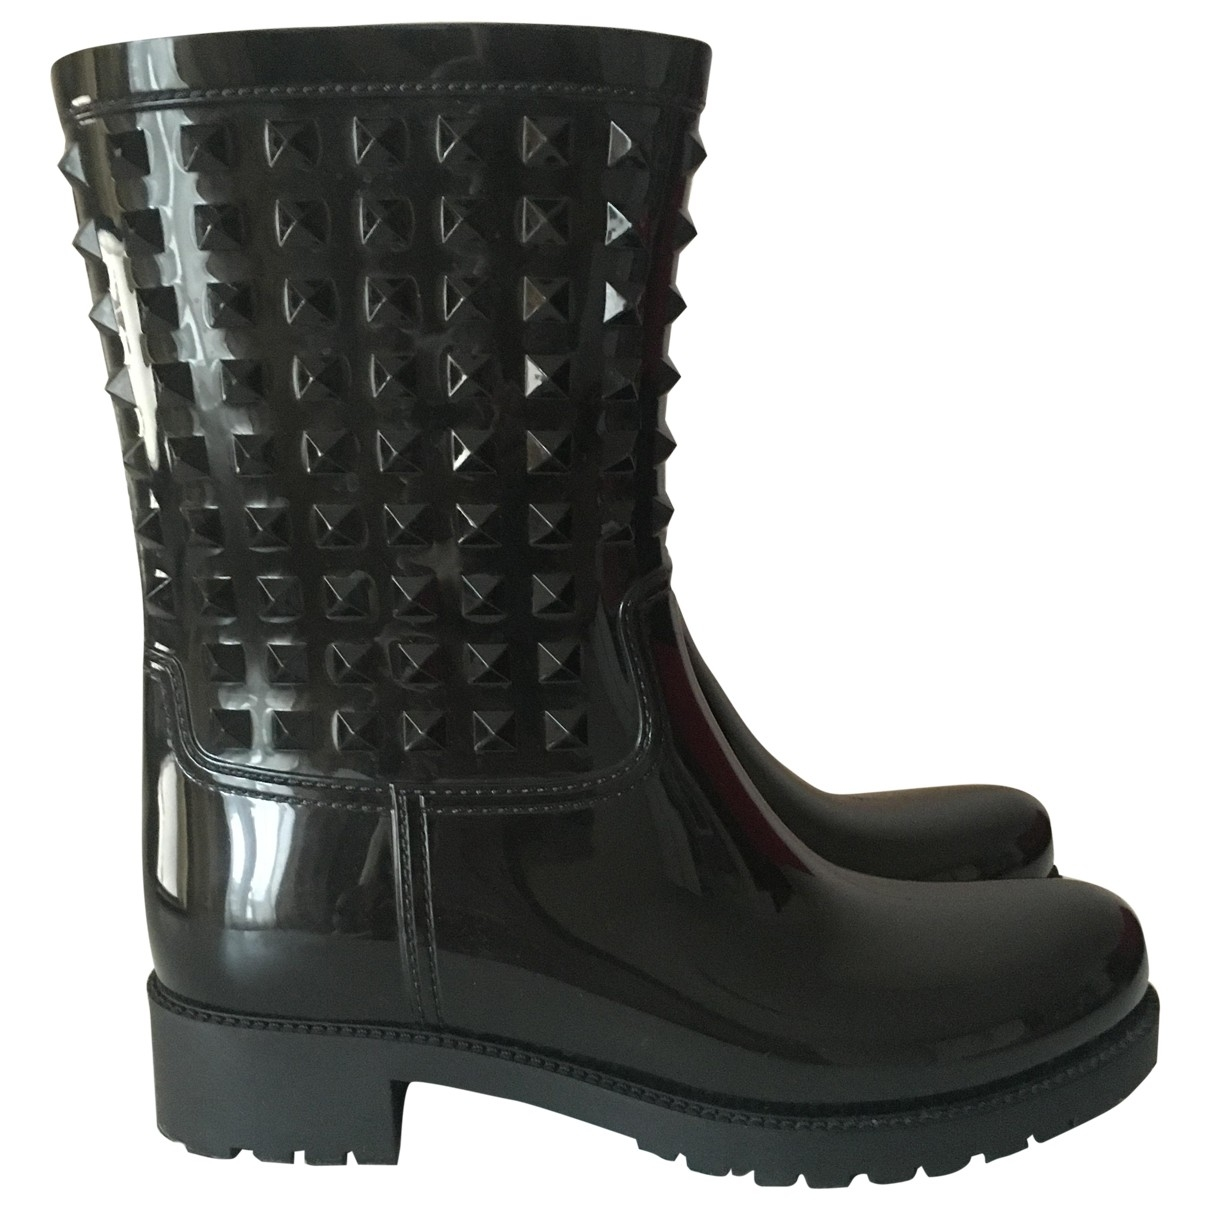 Valentino Garavani Rockstud Black Rubber Boots for Women 39 EU